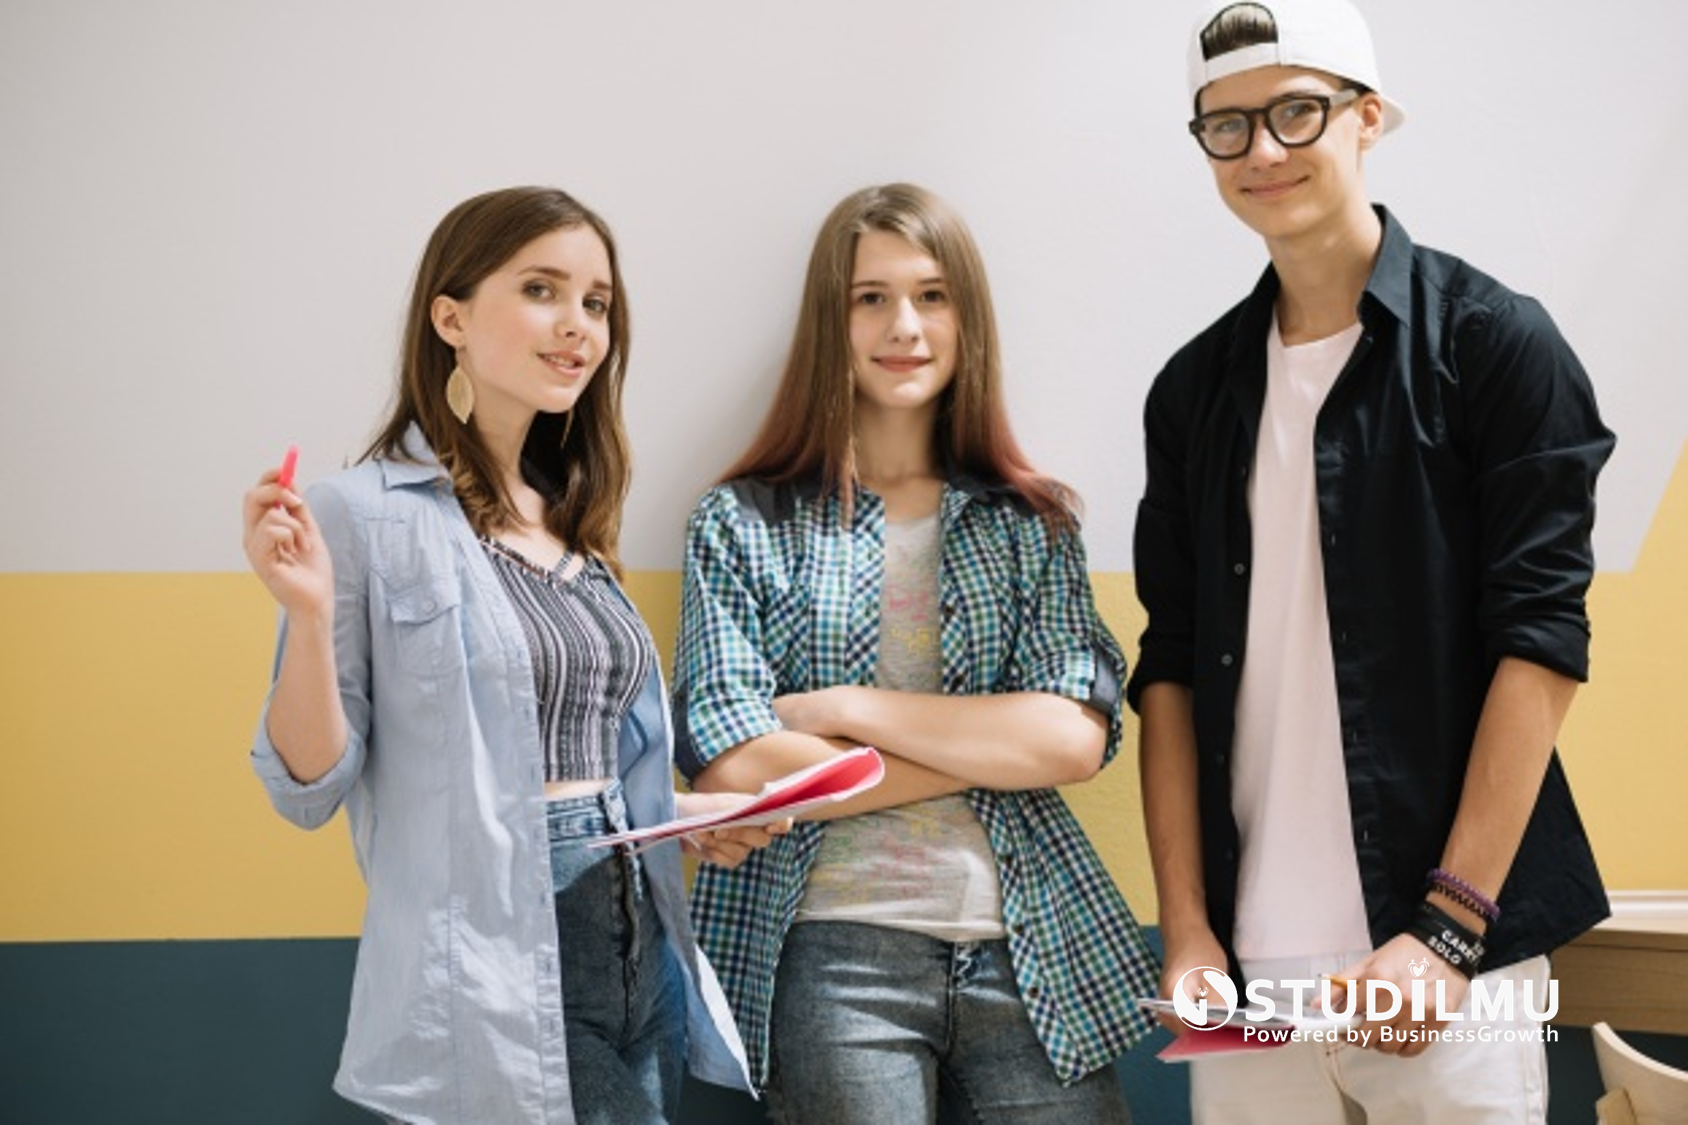 STUDILMU Career Advice - Menjembatani Gap antara Generasi X, Y, Z